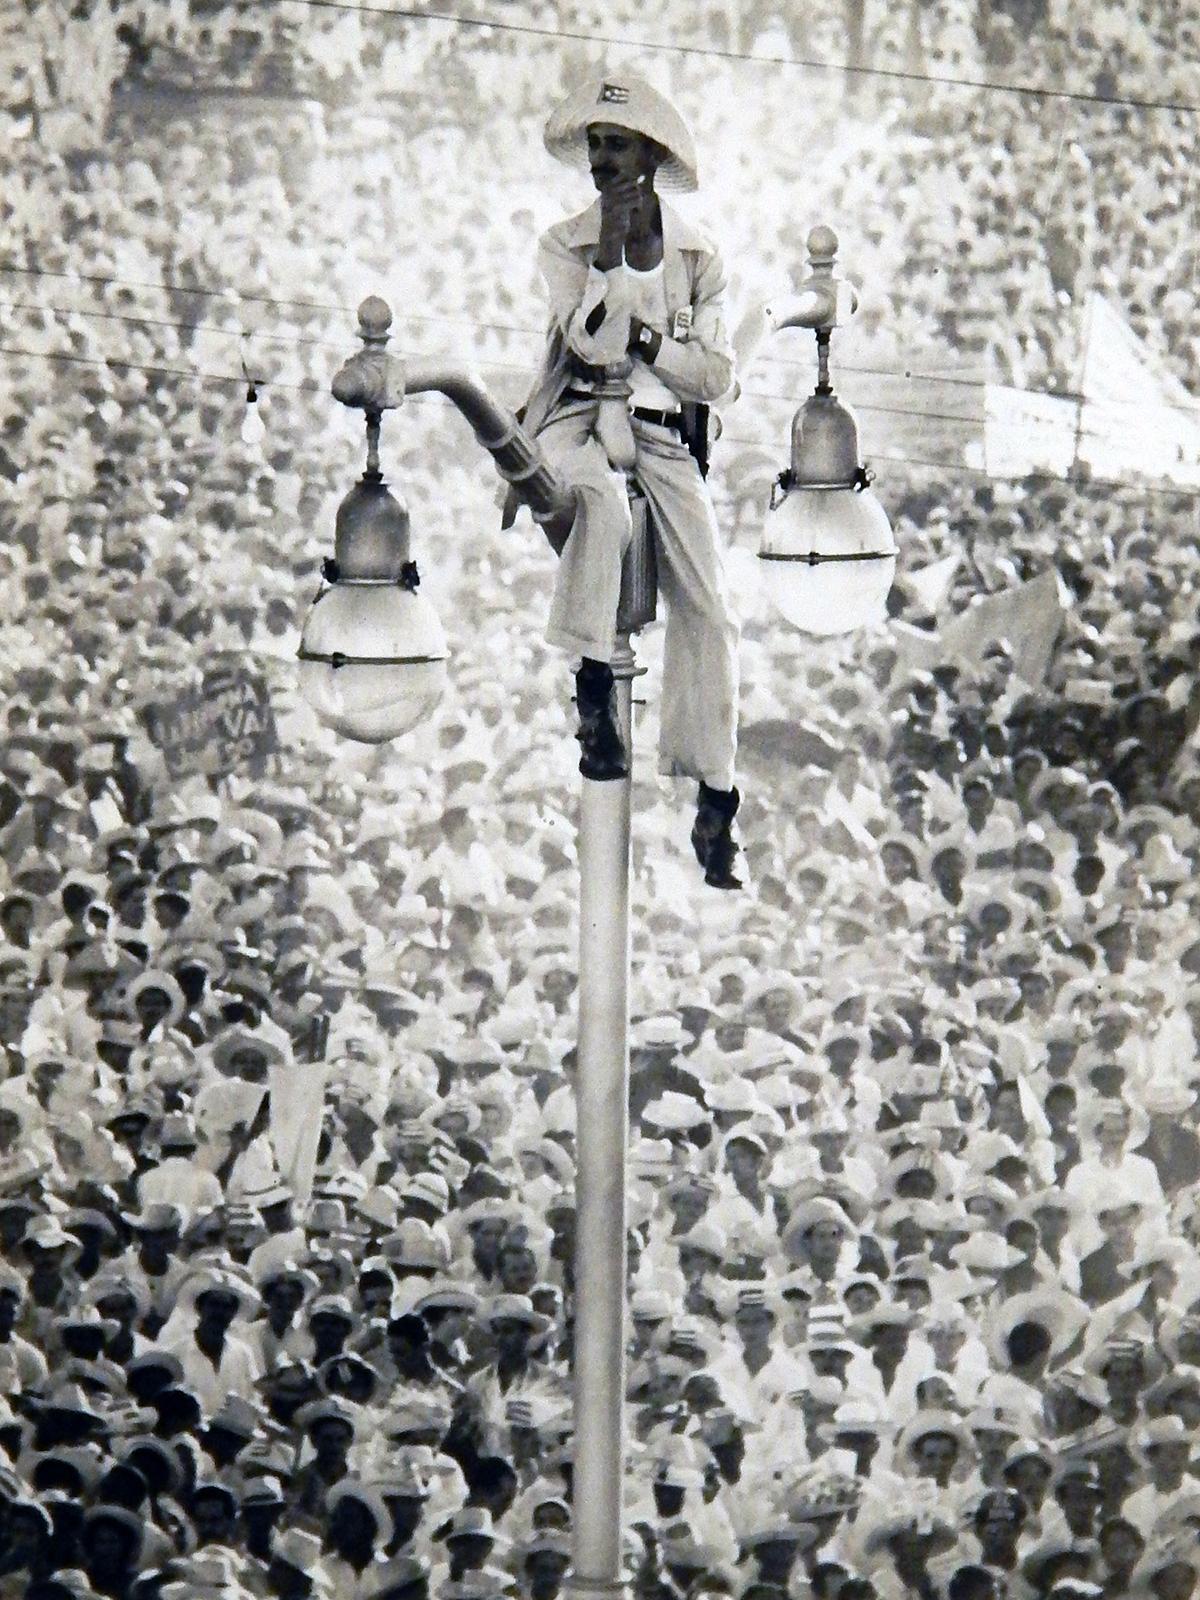 Alberto Korda,  Don Quixote of the Streetlamp, Havana, Cuba  (1959)